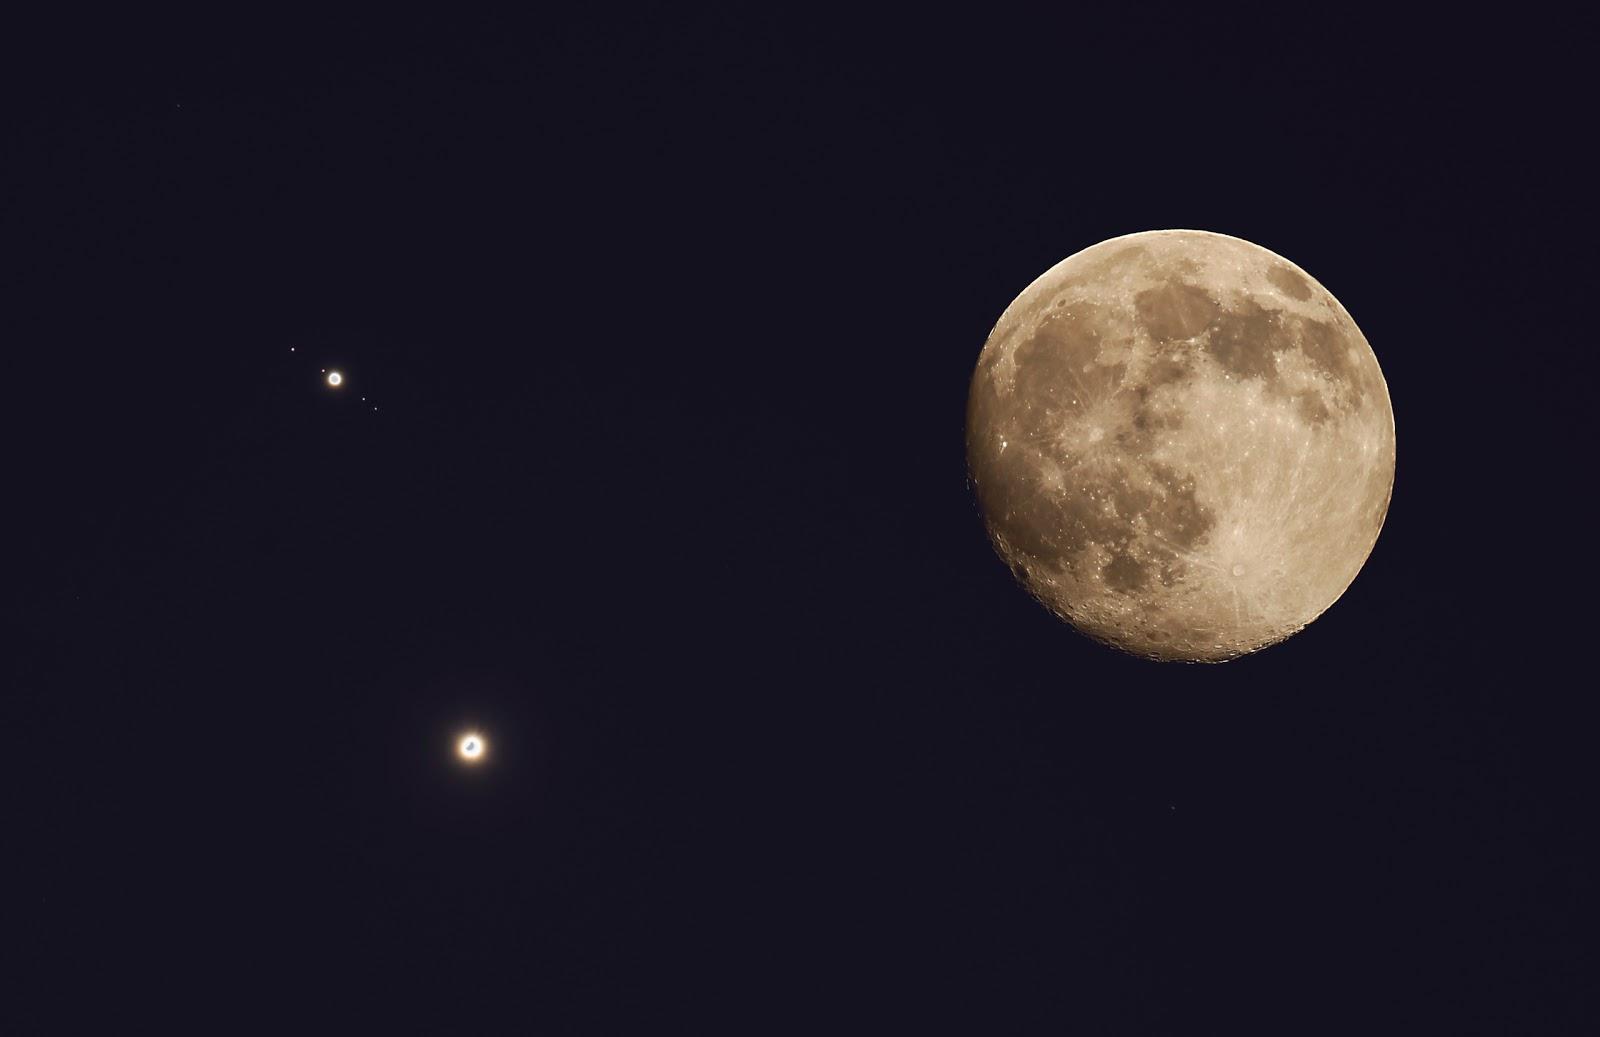 venus and its moons - photo #1